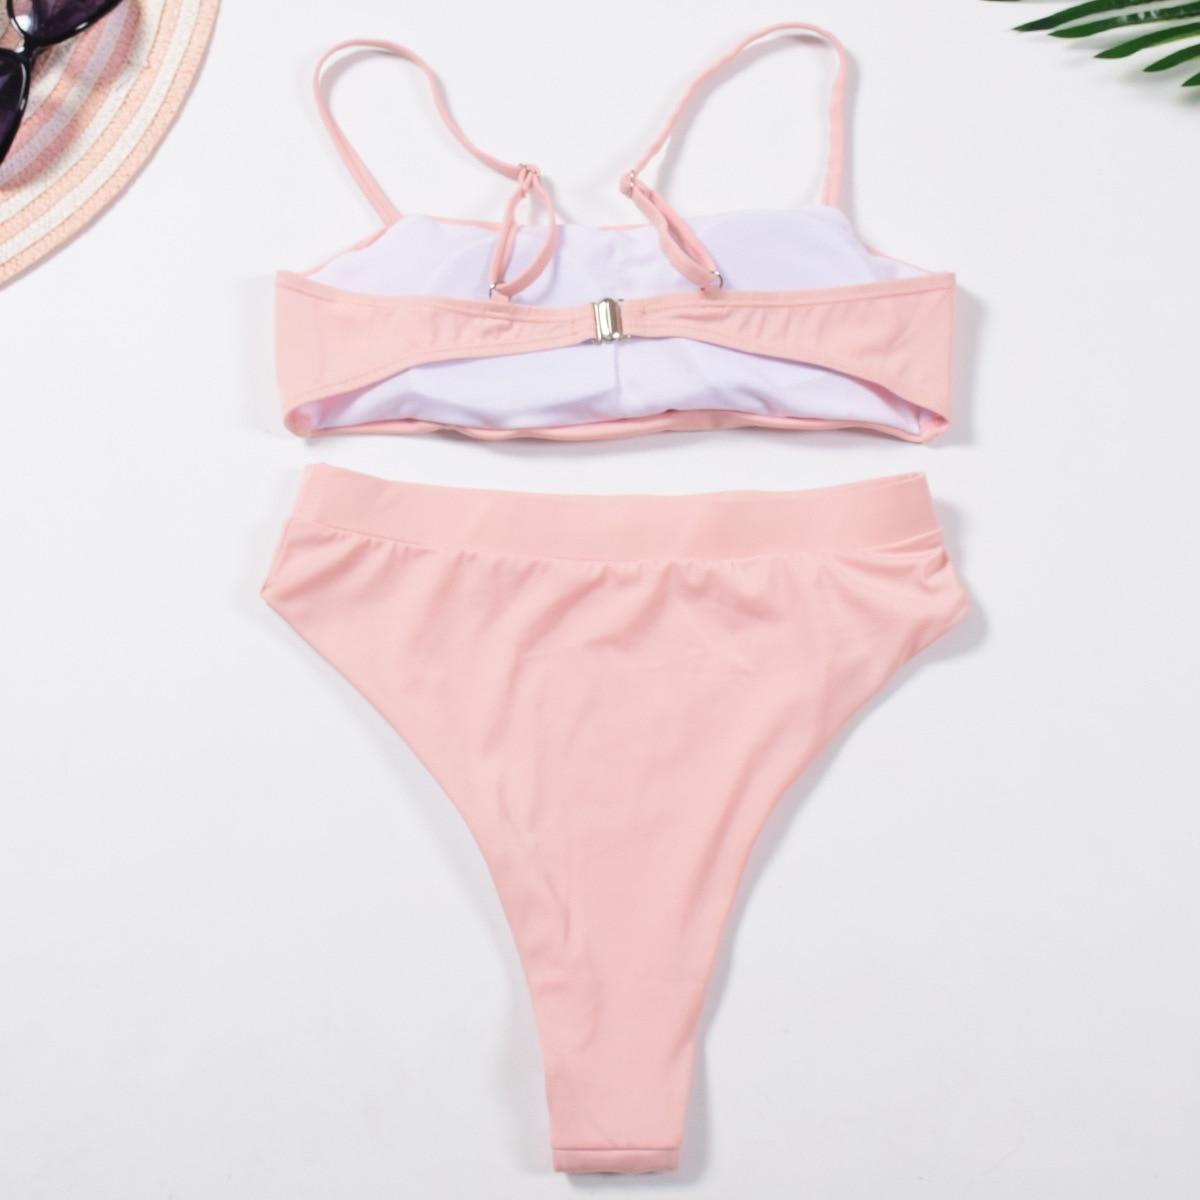 HTB1RiJ2SAvoK1RjSZFwq6AiCFXaY Micro Bikini Women Bandage Swimwear Swimsuit Bathing Suit Solid Bikini Push Up Beach Wear Maillot De Bain Brazilian Bikini